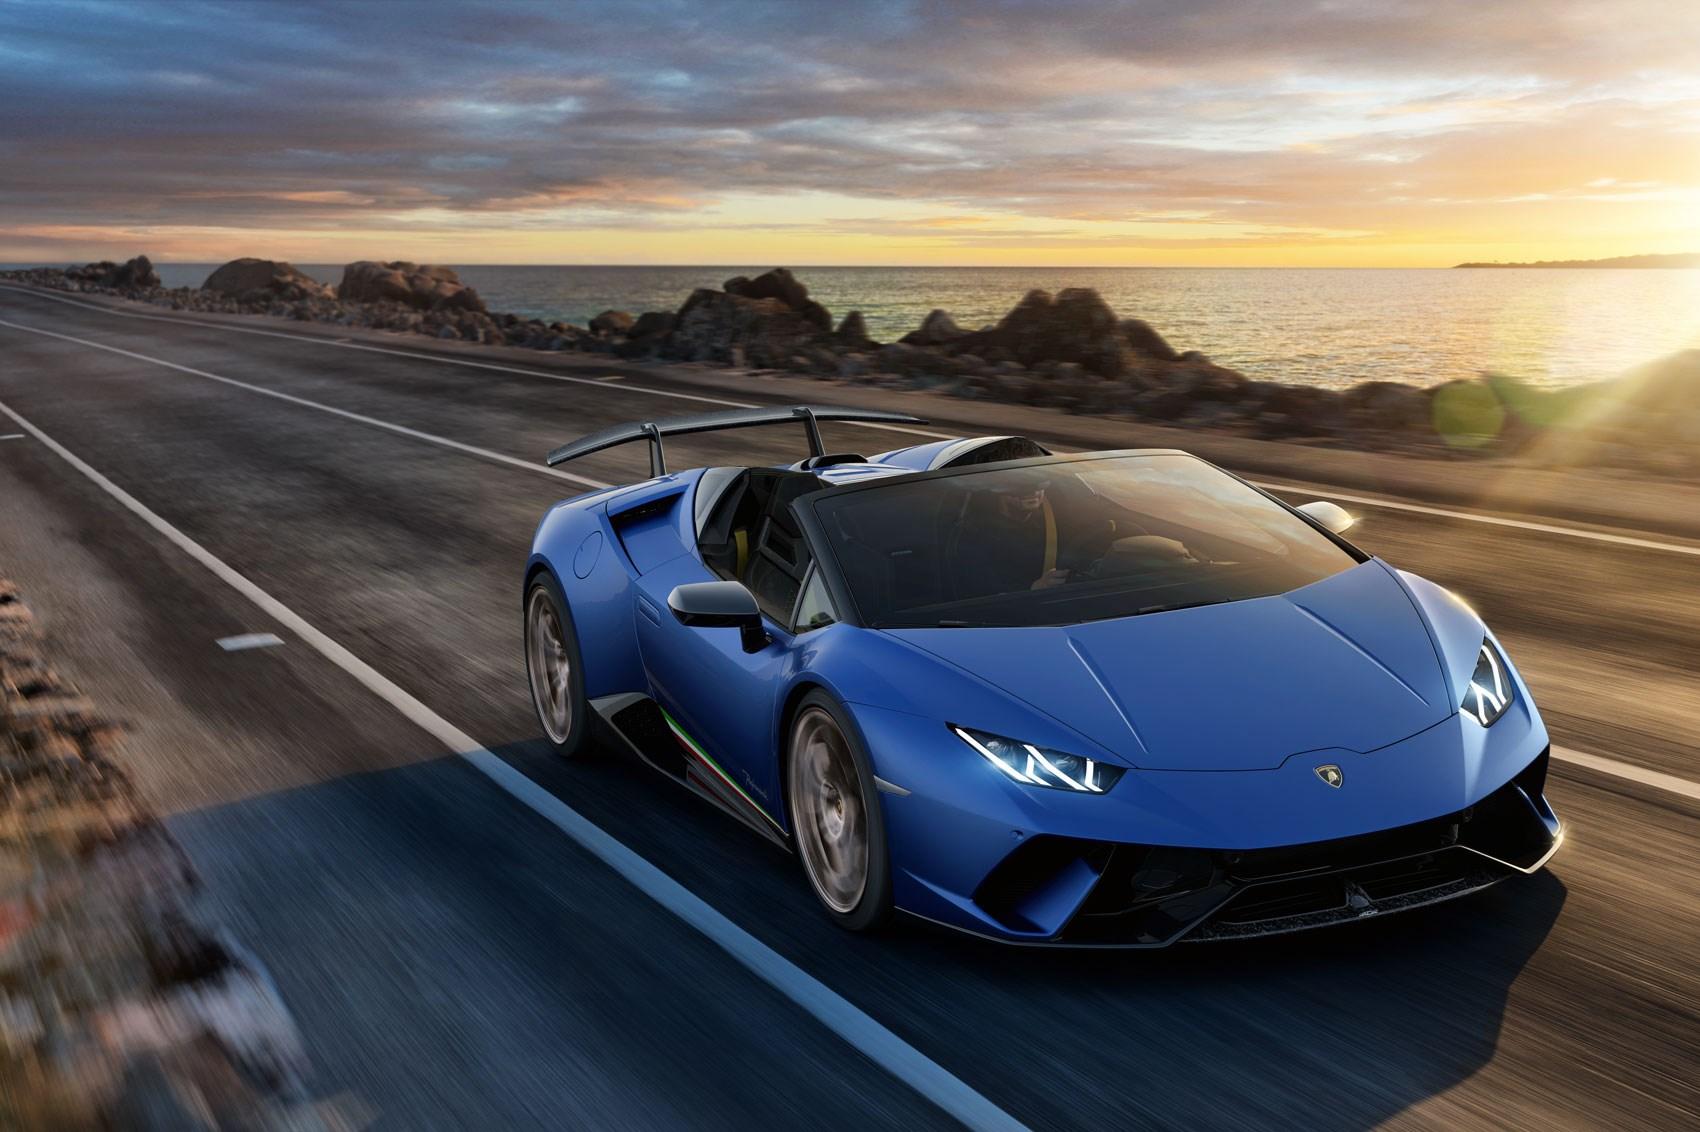 sxdrv,convertible supercar,all-wheel-drive,443 lb-ft,630 hp,5.2-litre V10,$308 859,Lamborghini Huracan Performante Spyder,